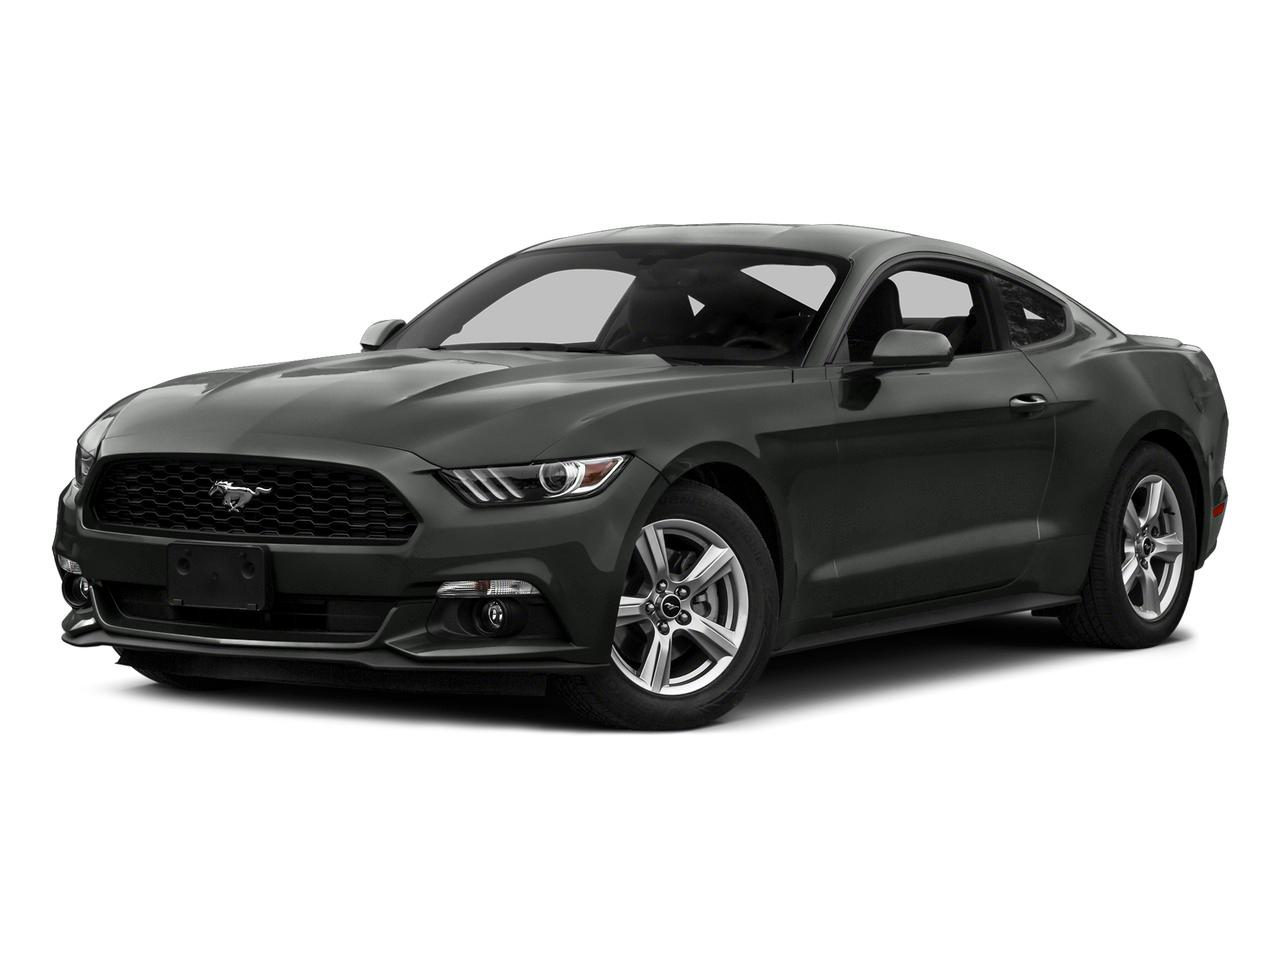 2015 Ford Mustang Vehicle Photo in San Antonio, TX 78230